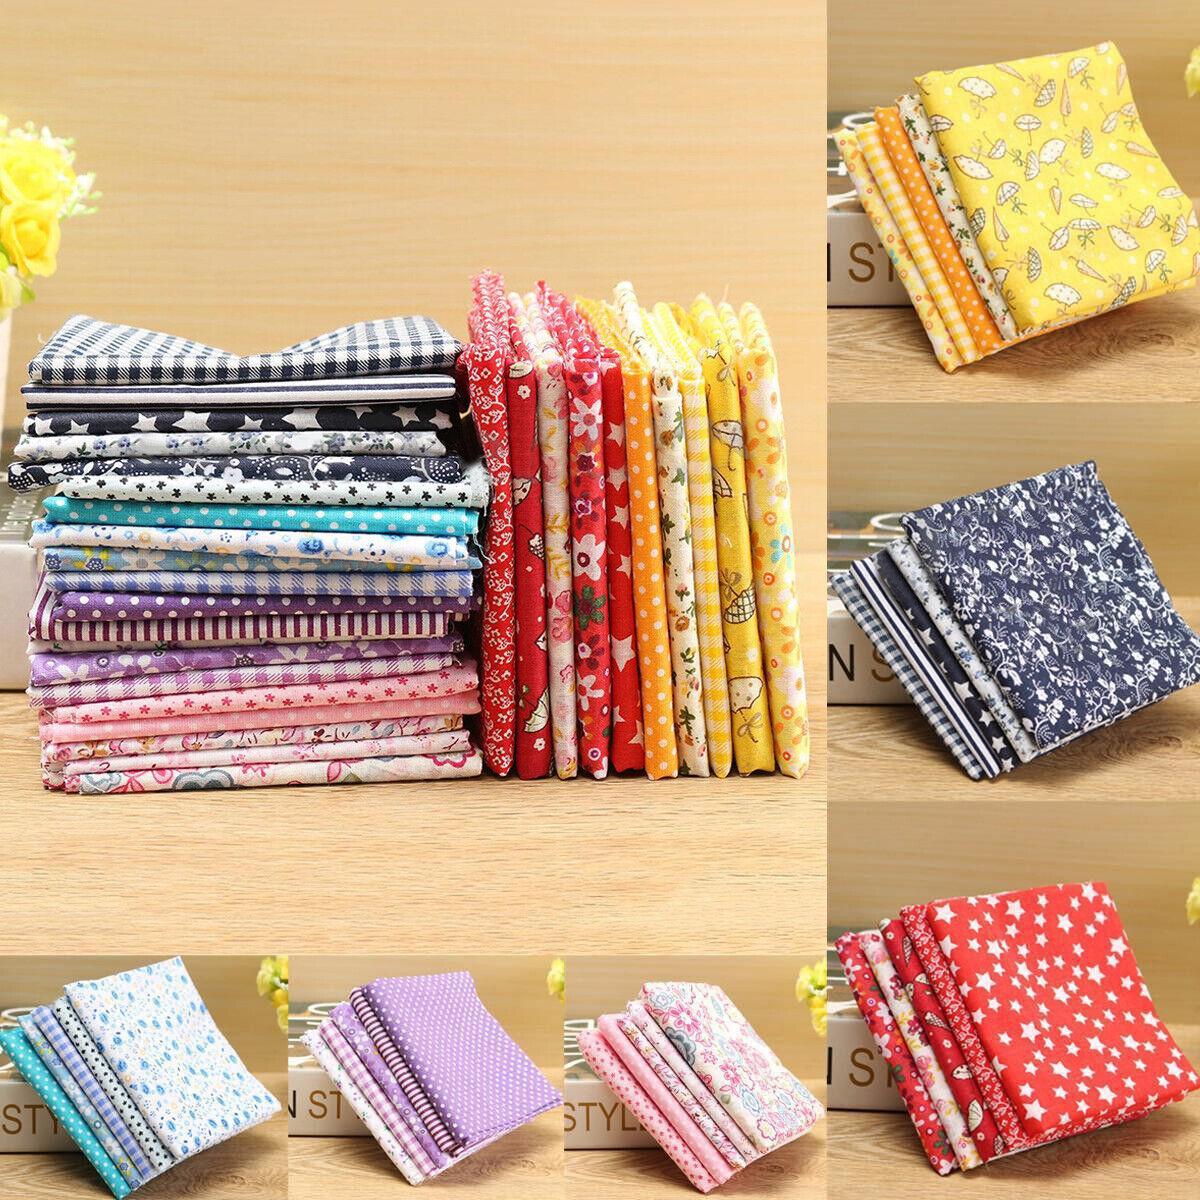 5Pcs 50x50cm Coton Tissu Patchwork Floral Coupons Assorti Joli Couture DIY 4